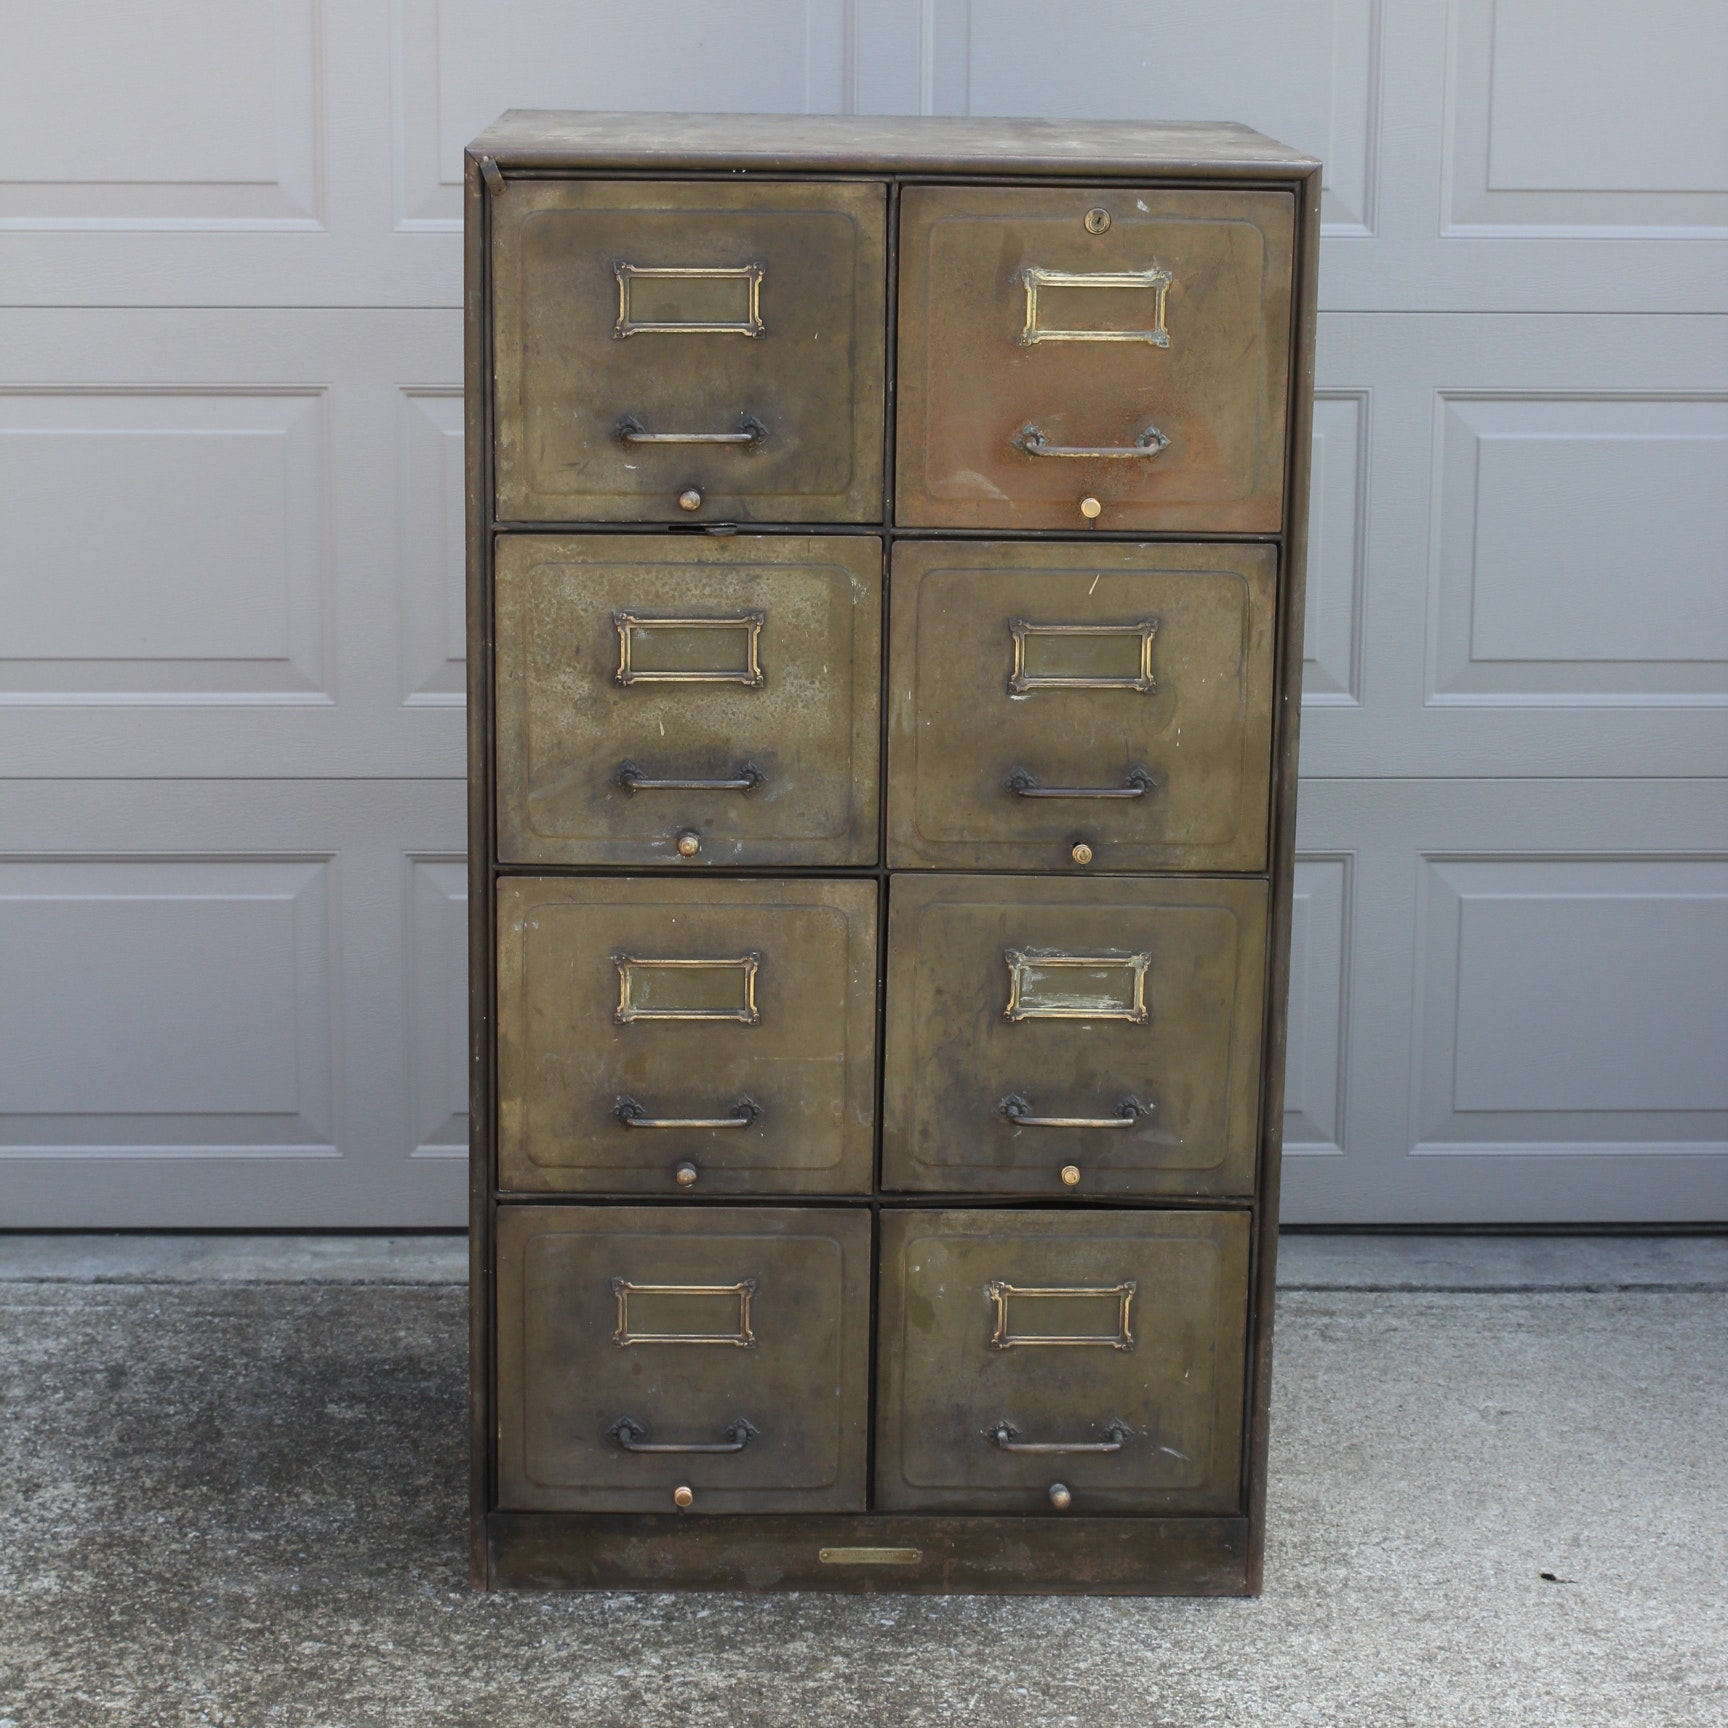 Antique Metal Filing Cabinet ...